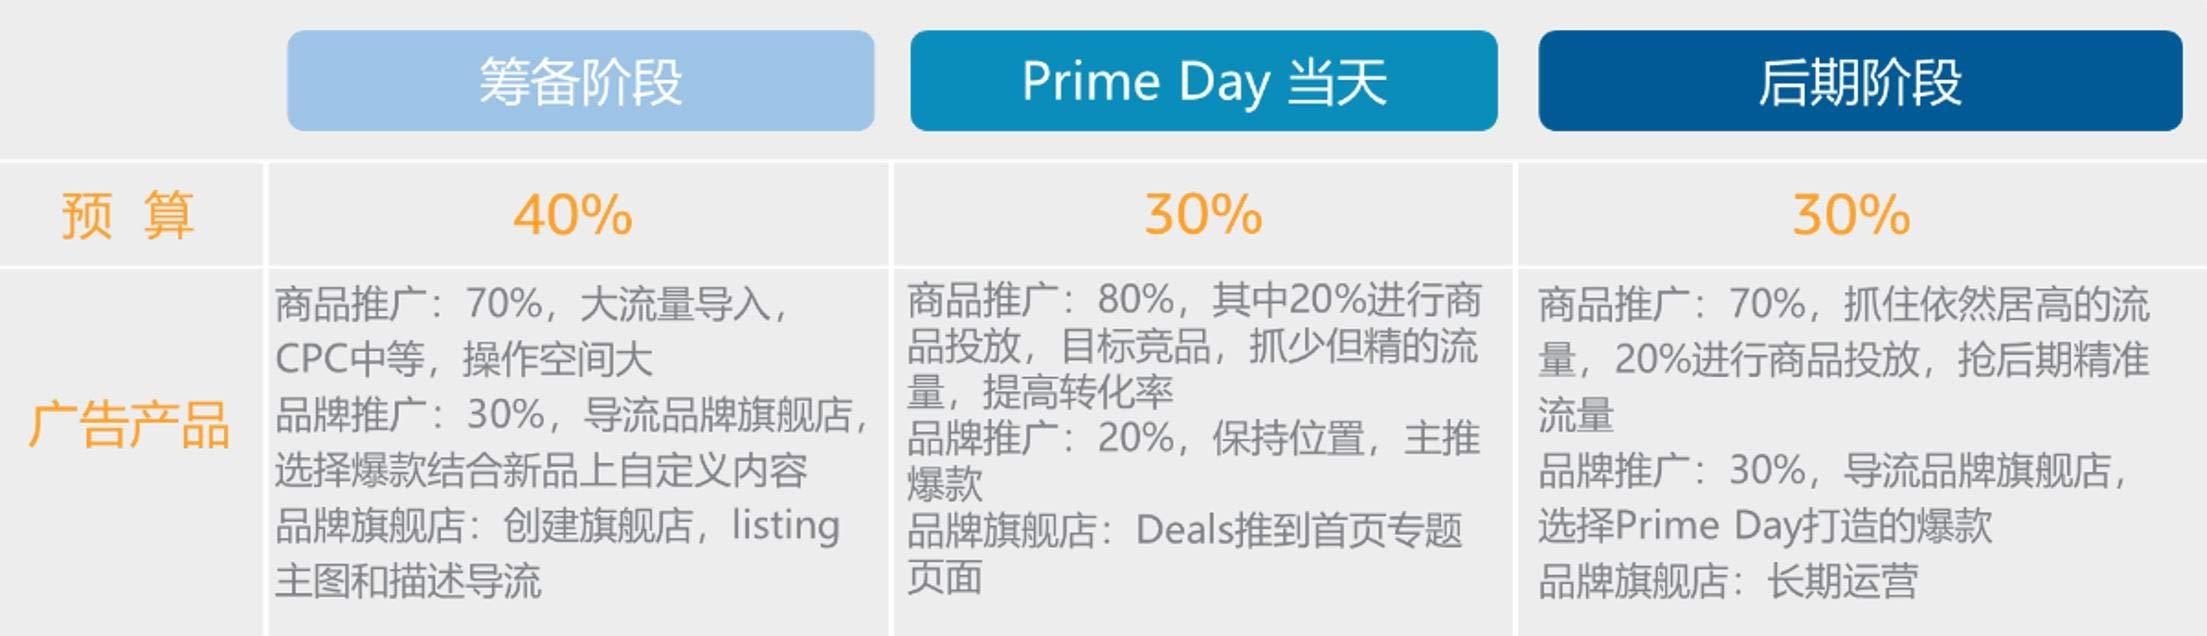 "Prime Day预算分配""配料表"""